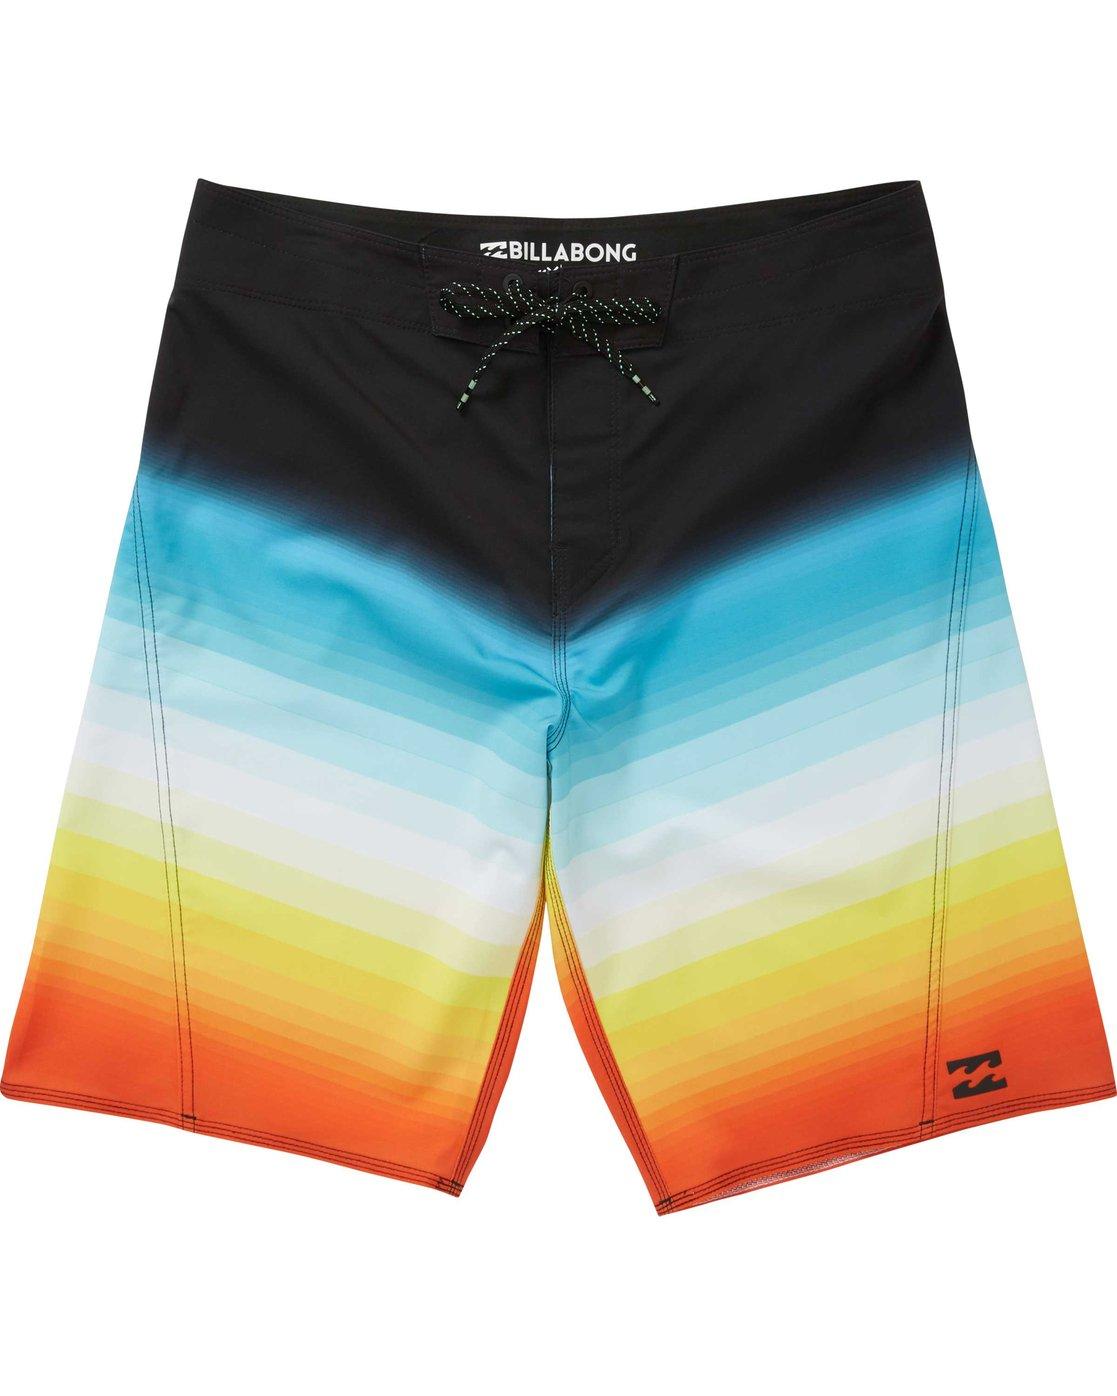 Billabong Boardshorts  New!!!